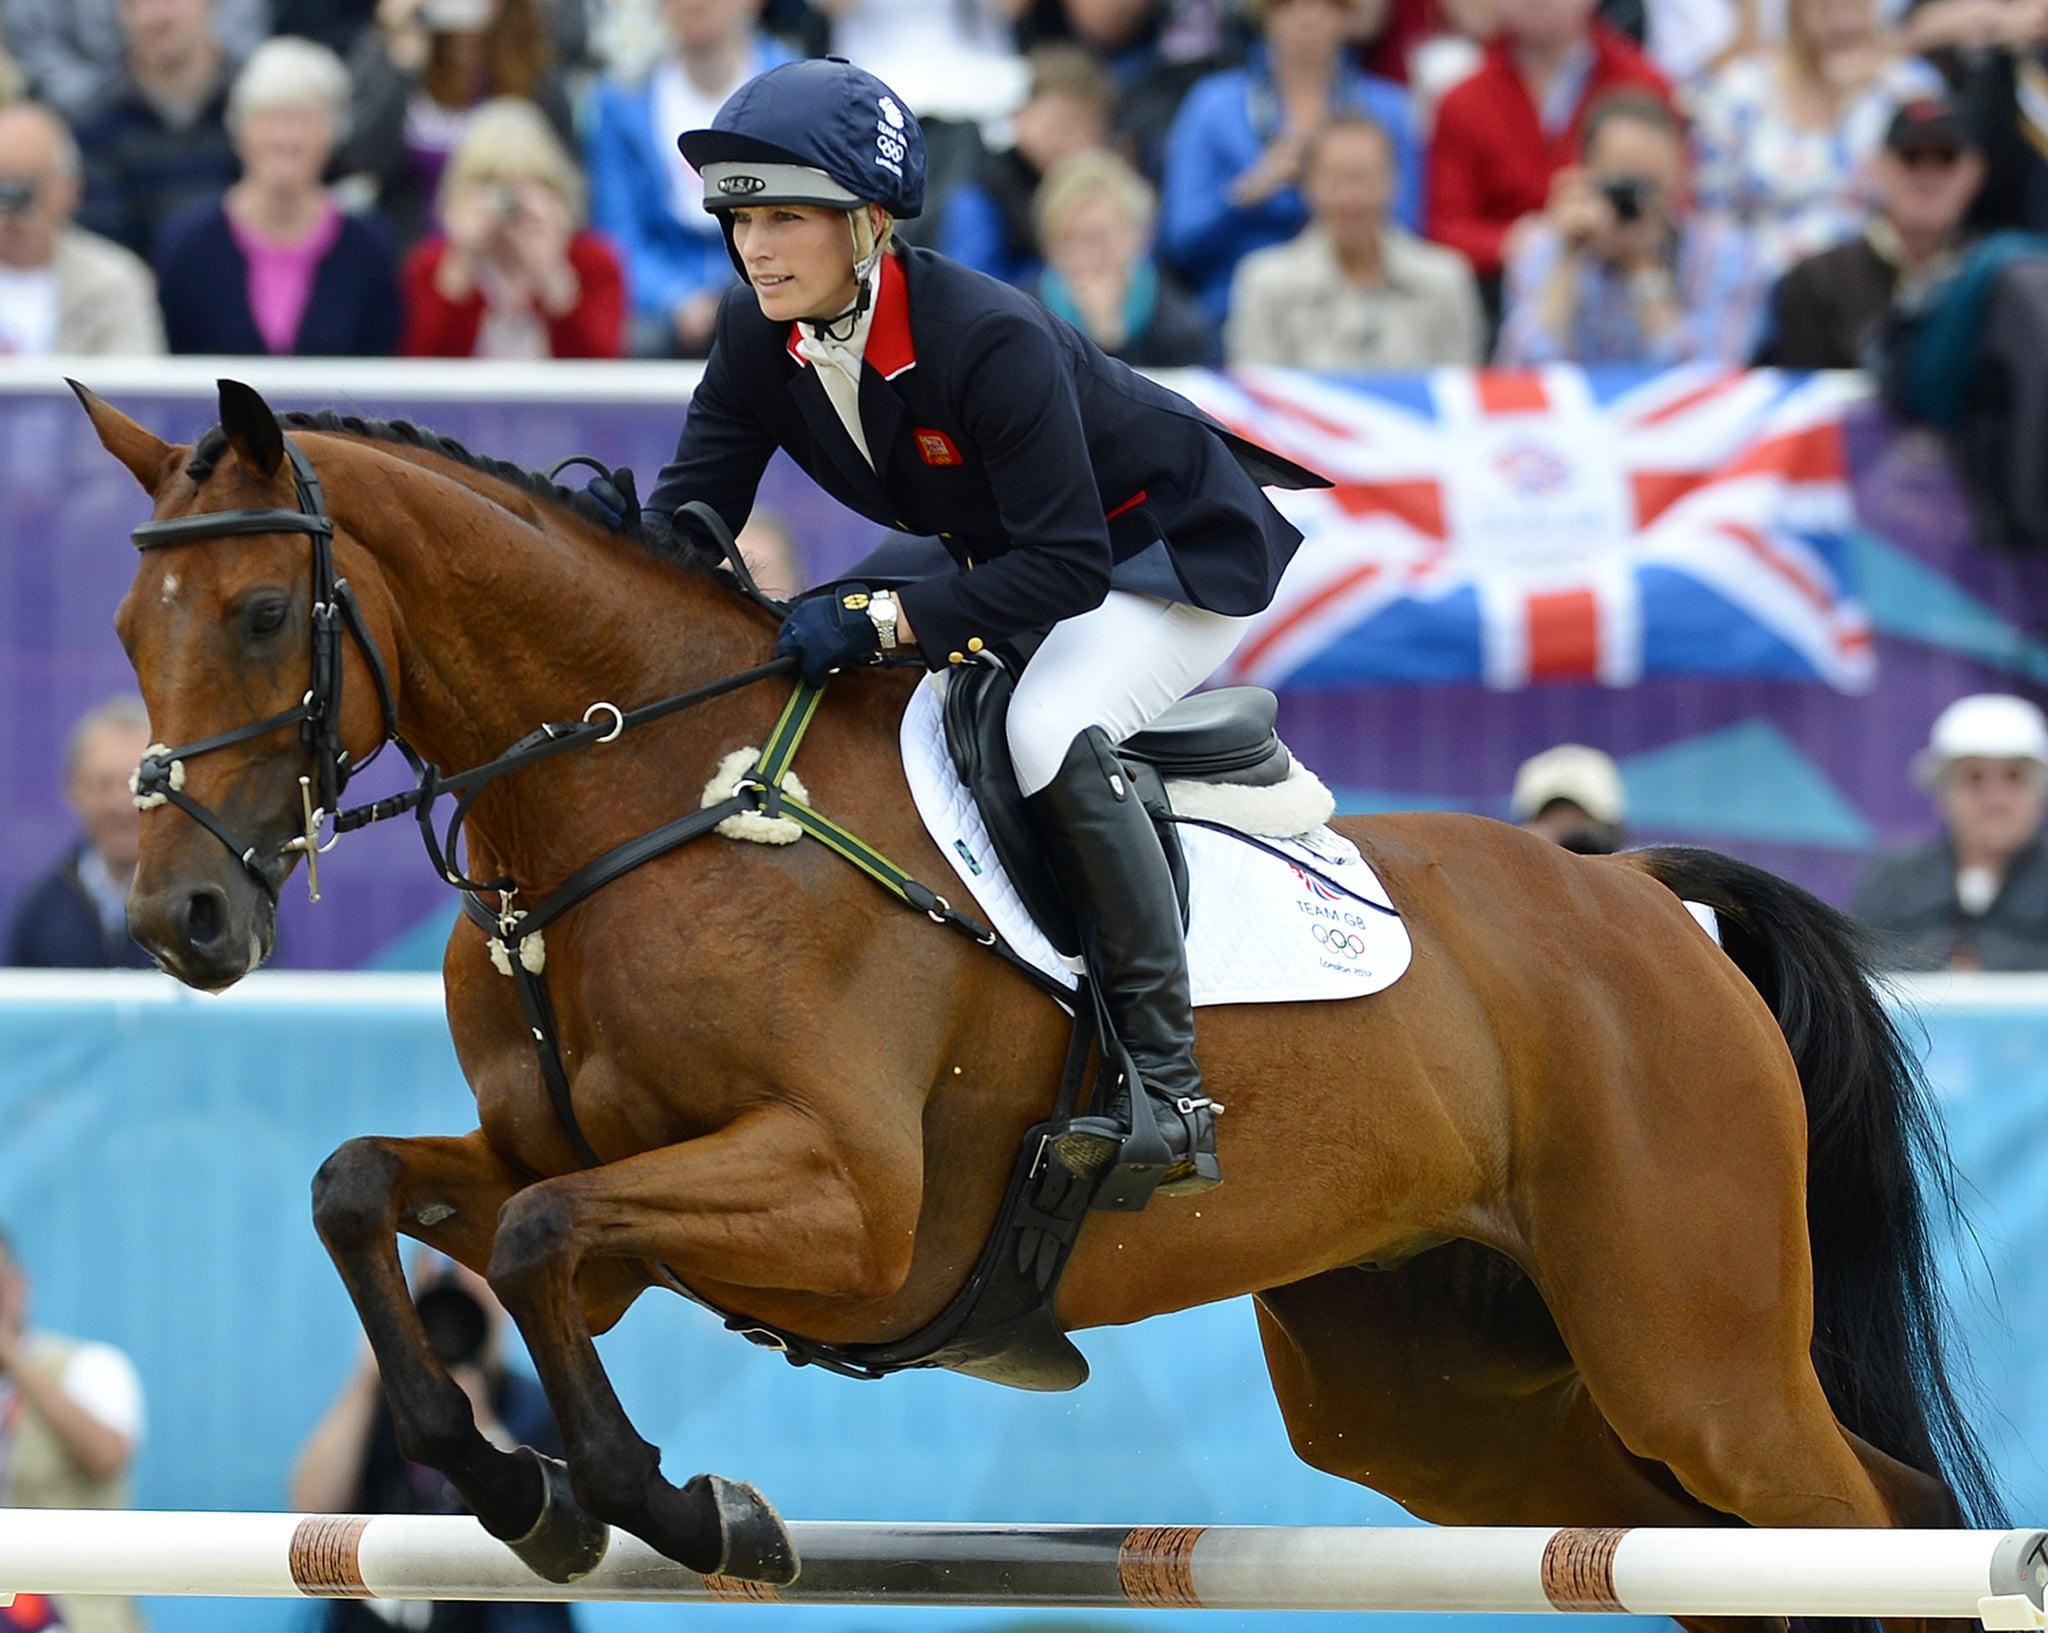 Zara Philips riding a horse